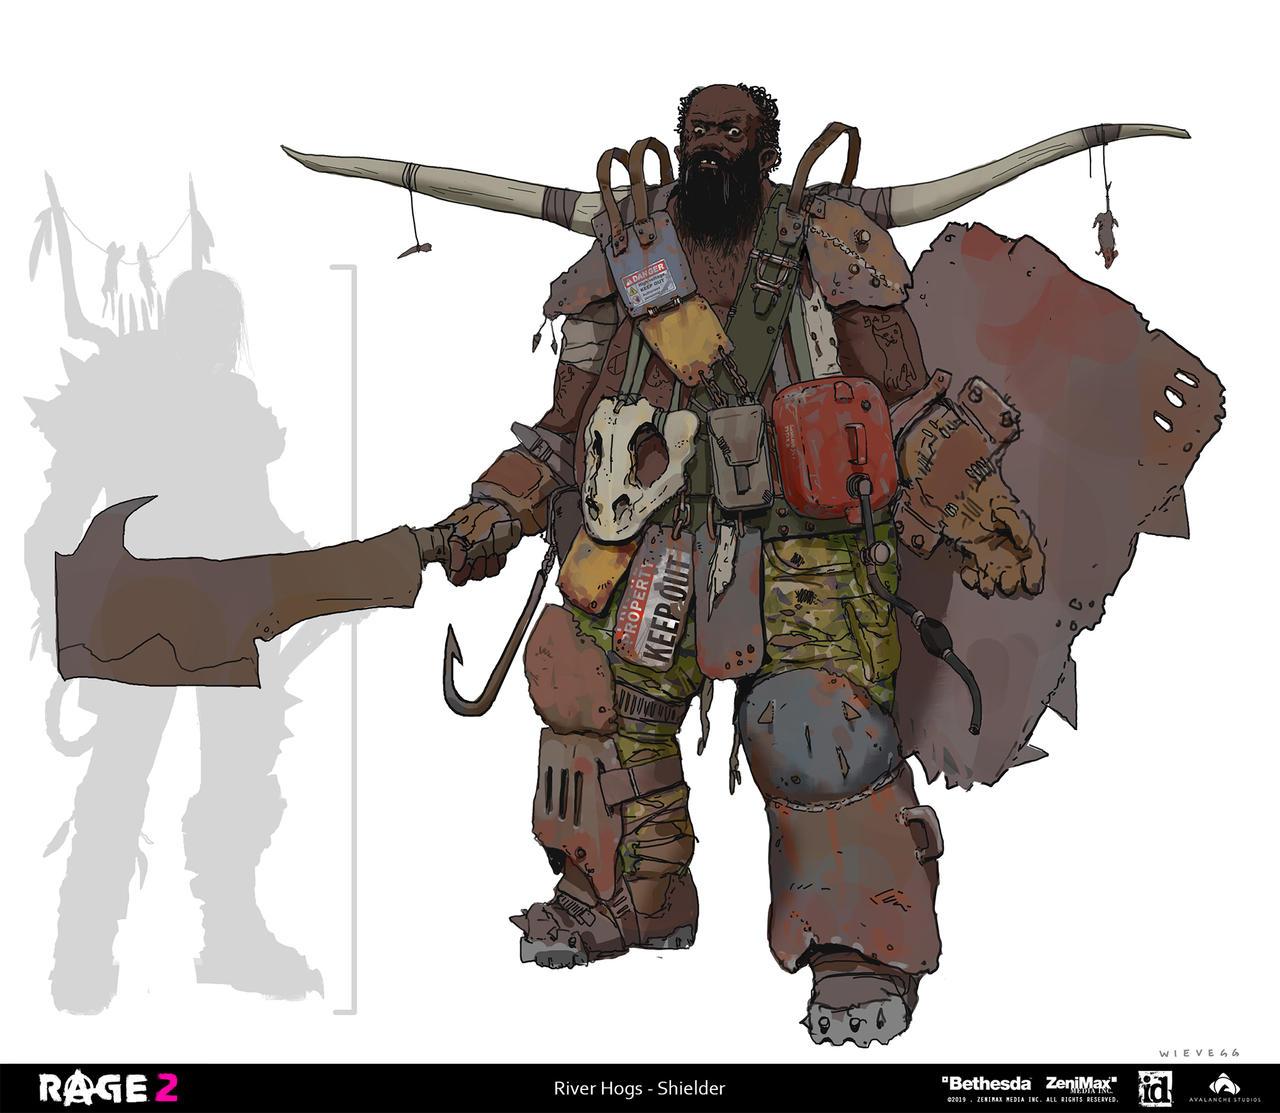 Rage 2 - River Hogs (Shielder)